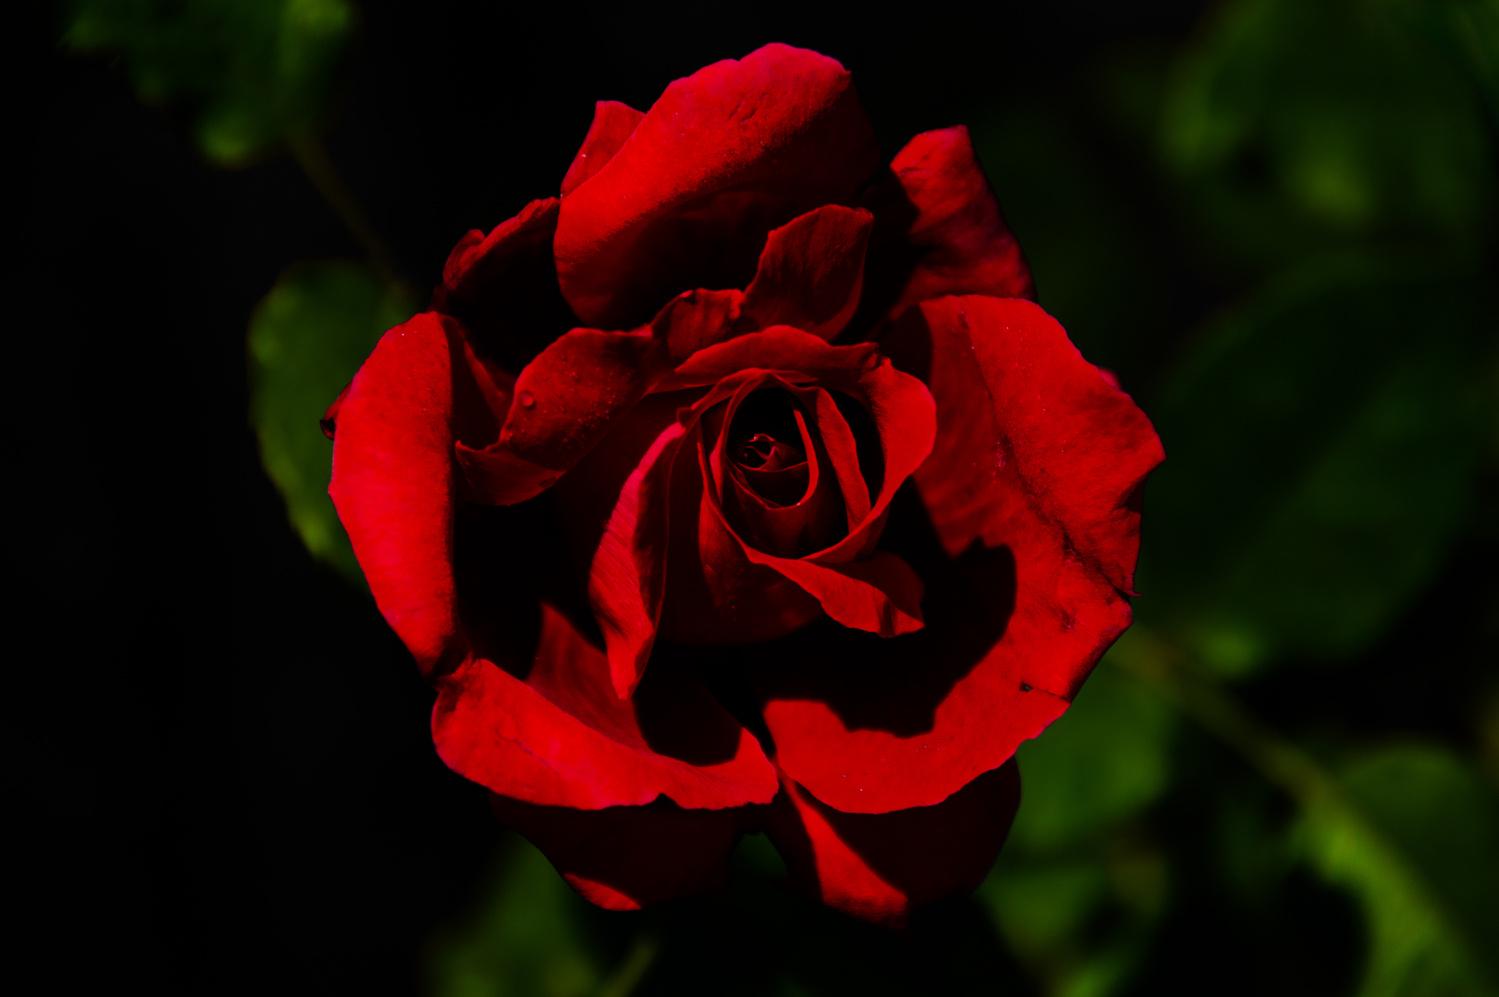 Rose by Jordi Jewell